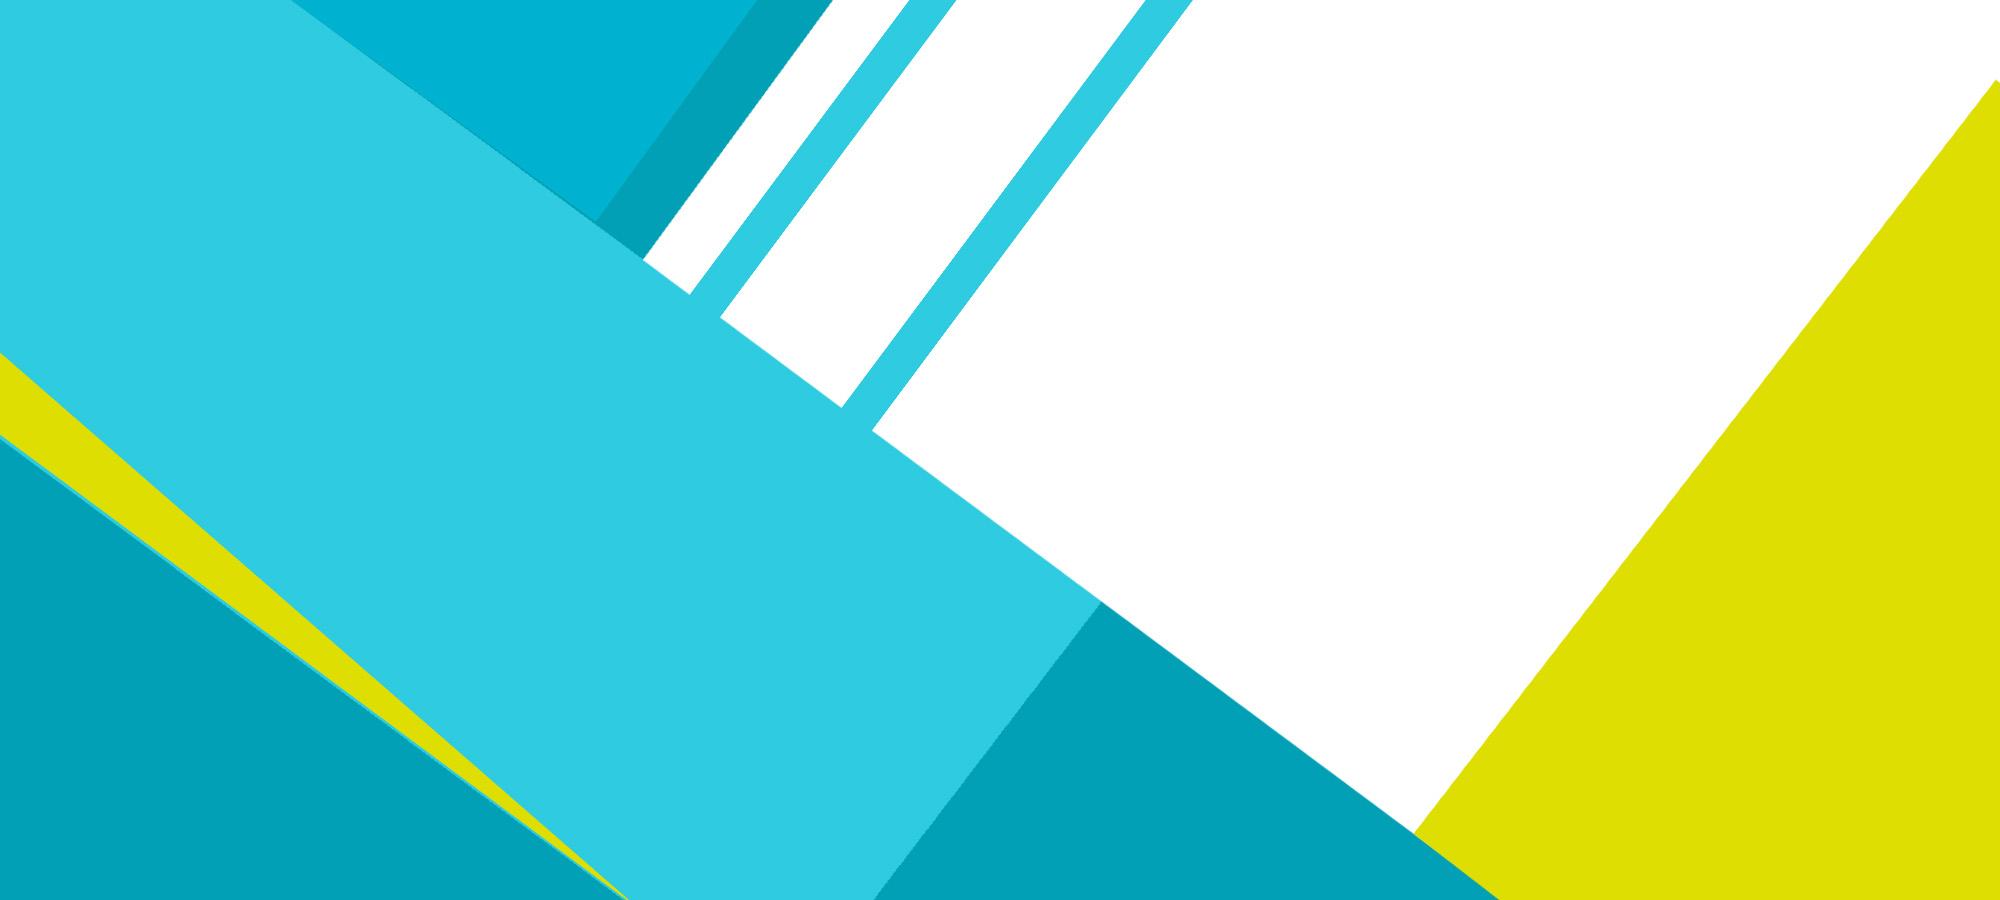 Diseño Arte Patrón Fondos De Pantalla Antecedentes: Graphic Diseño Fondos De Pantalla Arte Antecedentes